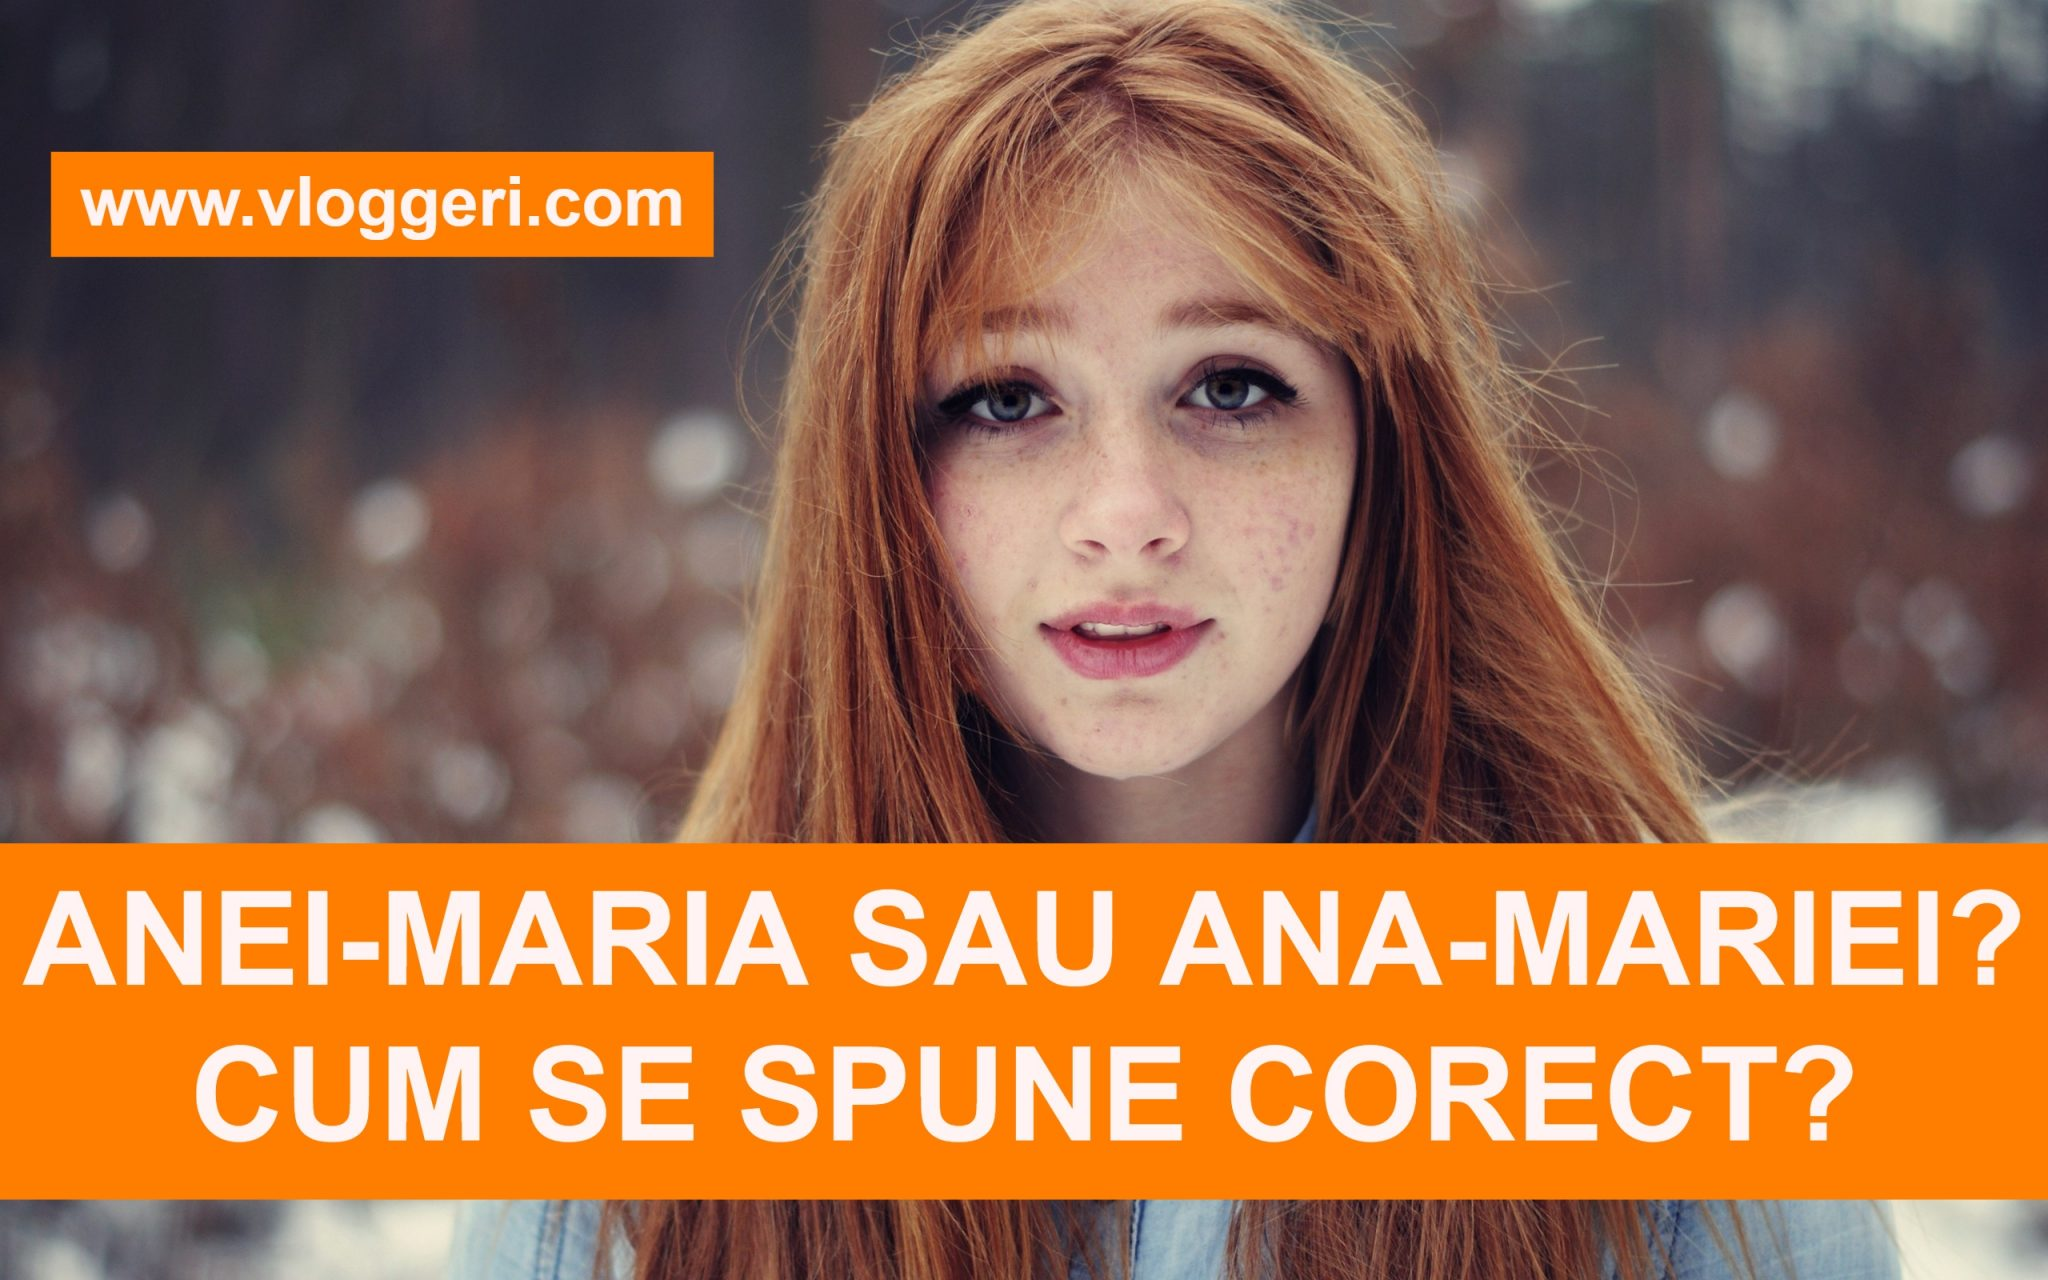 Ana-Mariei sau Anei-Maria? Cum se spune corect?